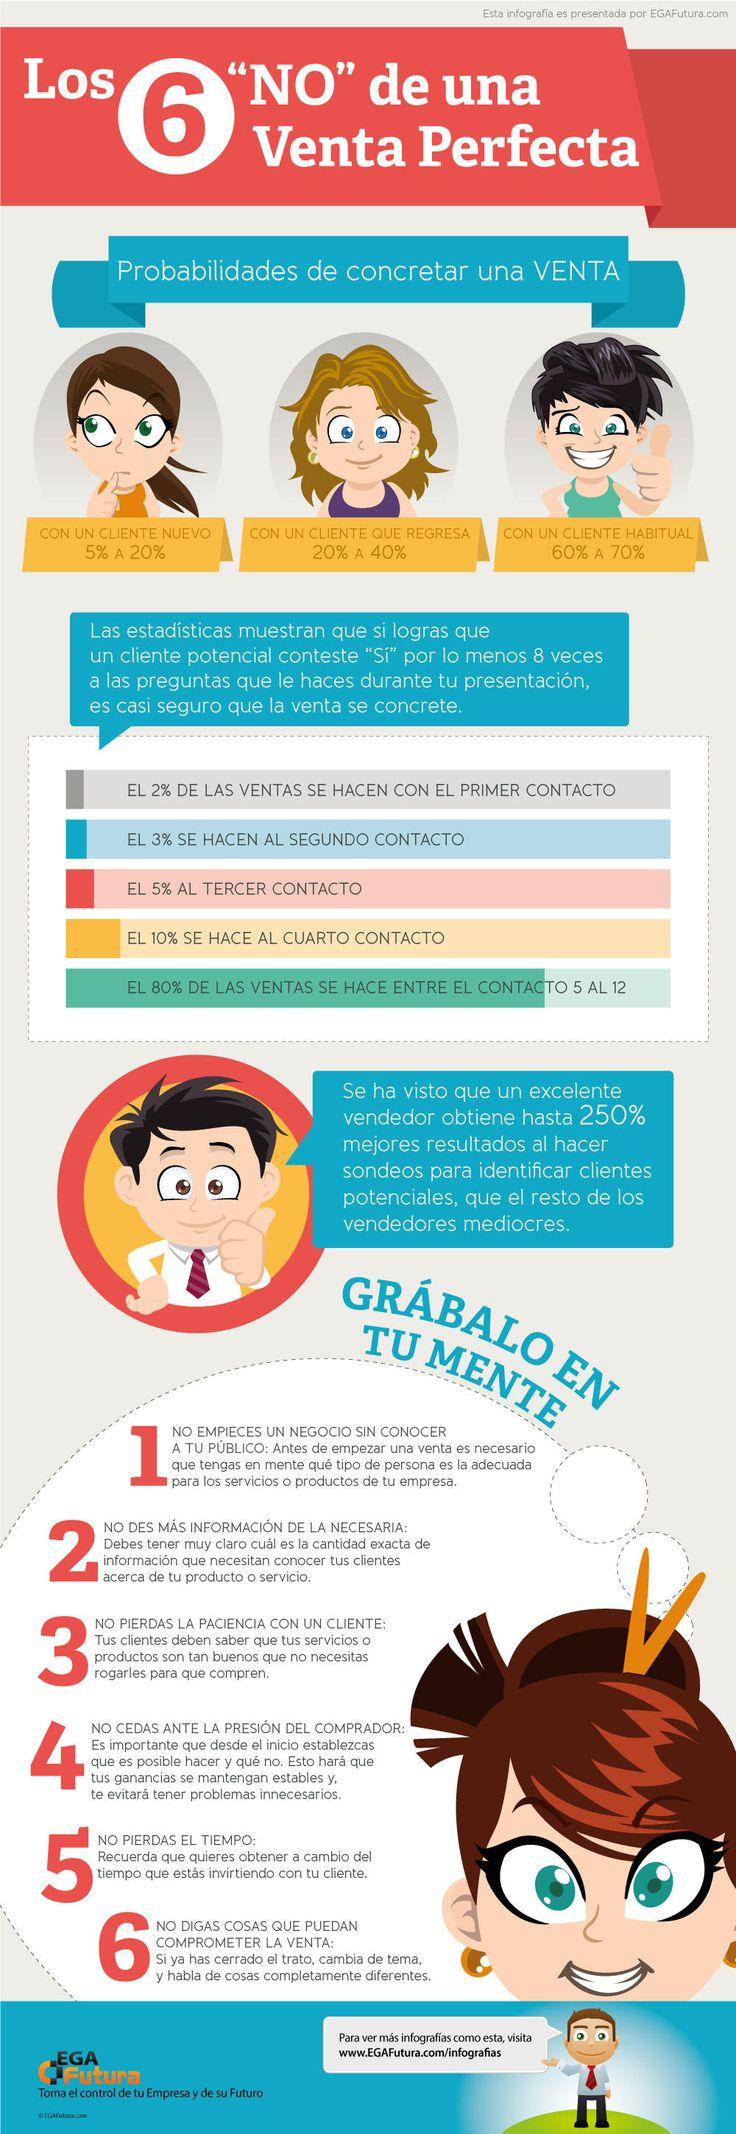 "Los 6 ""NO"" de una venta perfecta #infografia #infographic #marketing || Fuente http://www.egafutura.com/negocios/una-venta-perfecta"